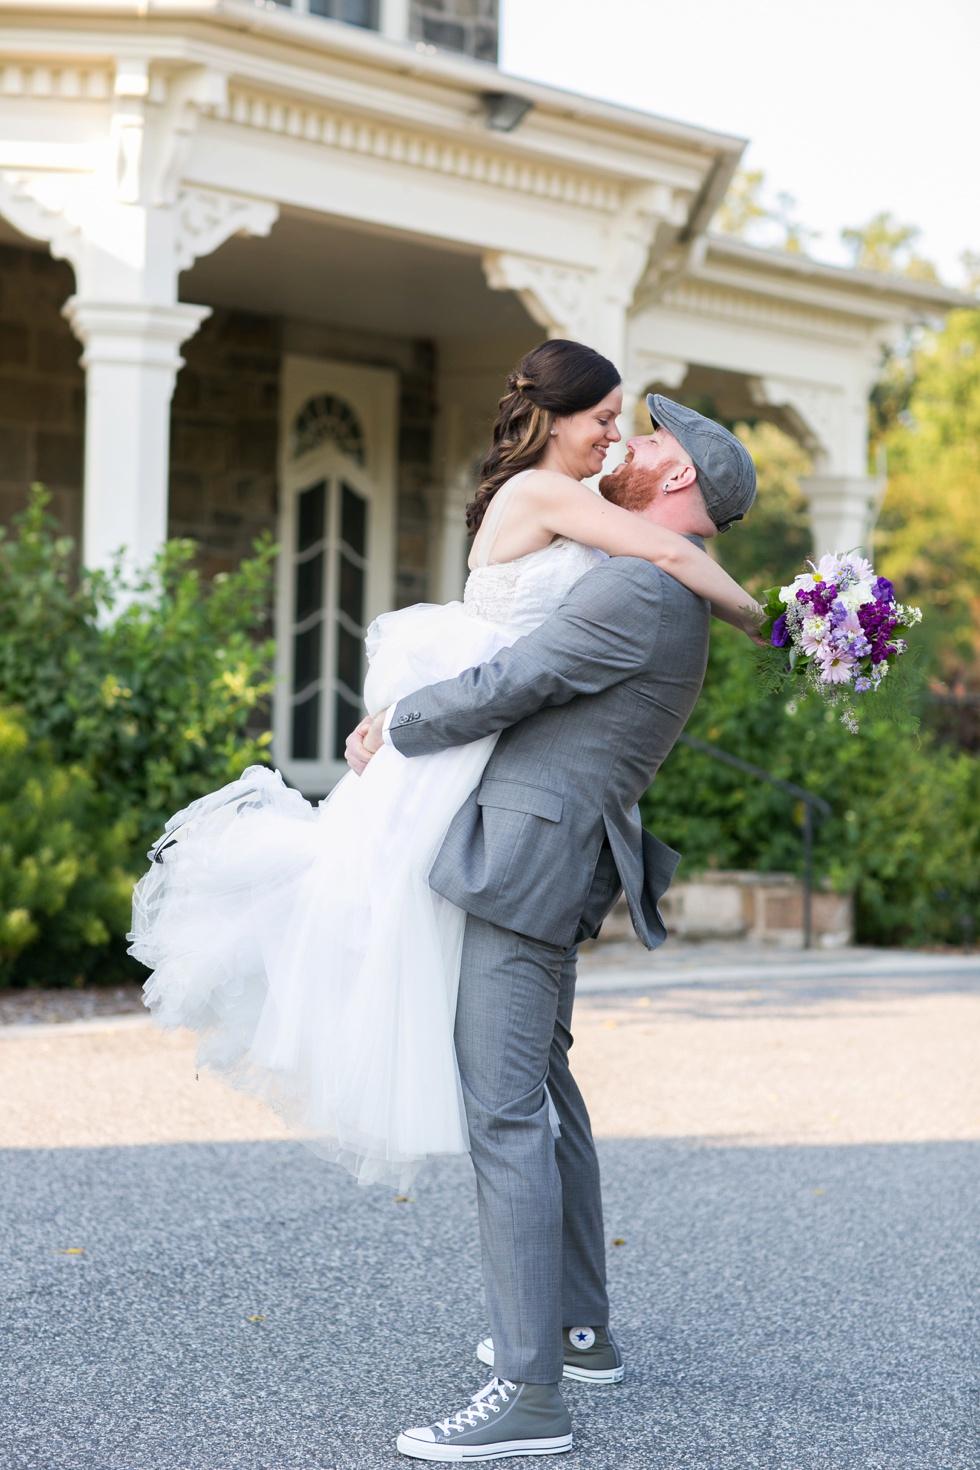 Cylburn Arboretum wedding - Best Wedding photographer of 2015